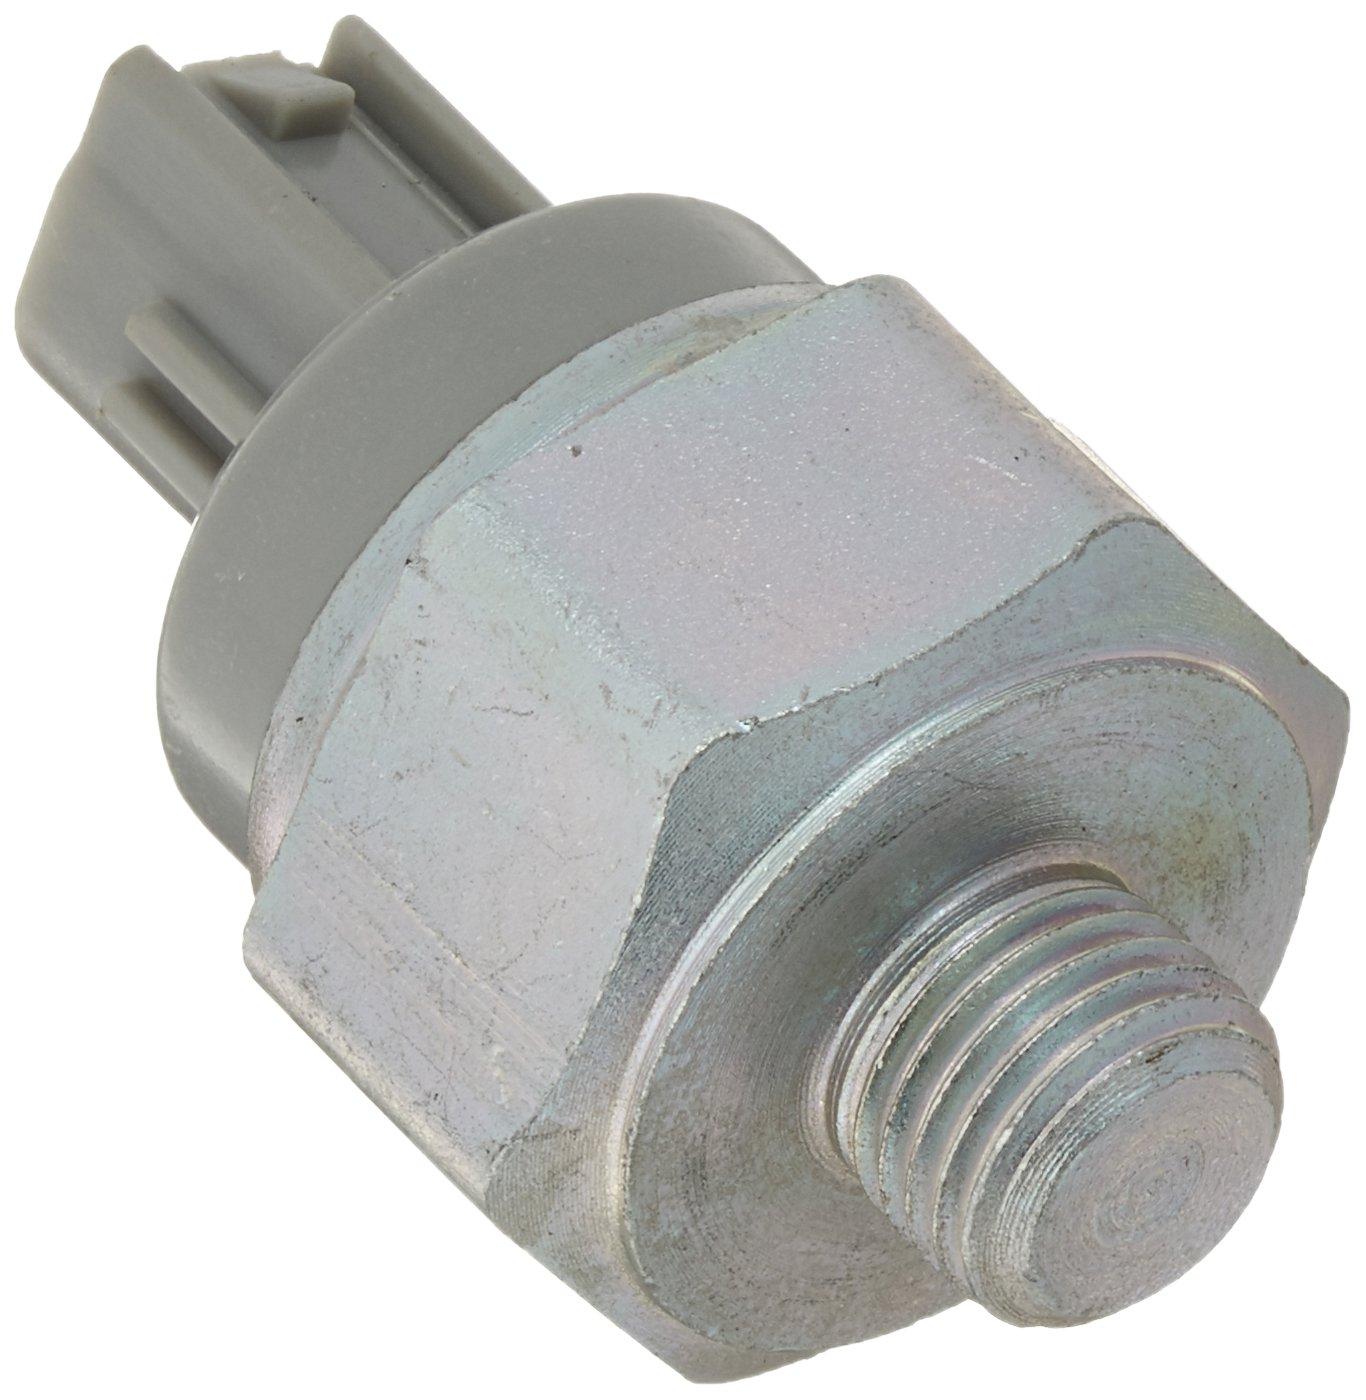 MTC 1010648 / 89615-30050 Knock Sensor (89615-30050 MTC 1010648)